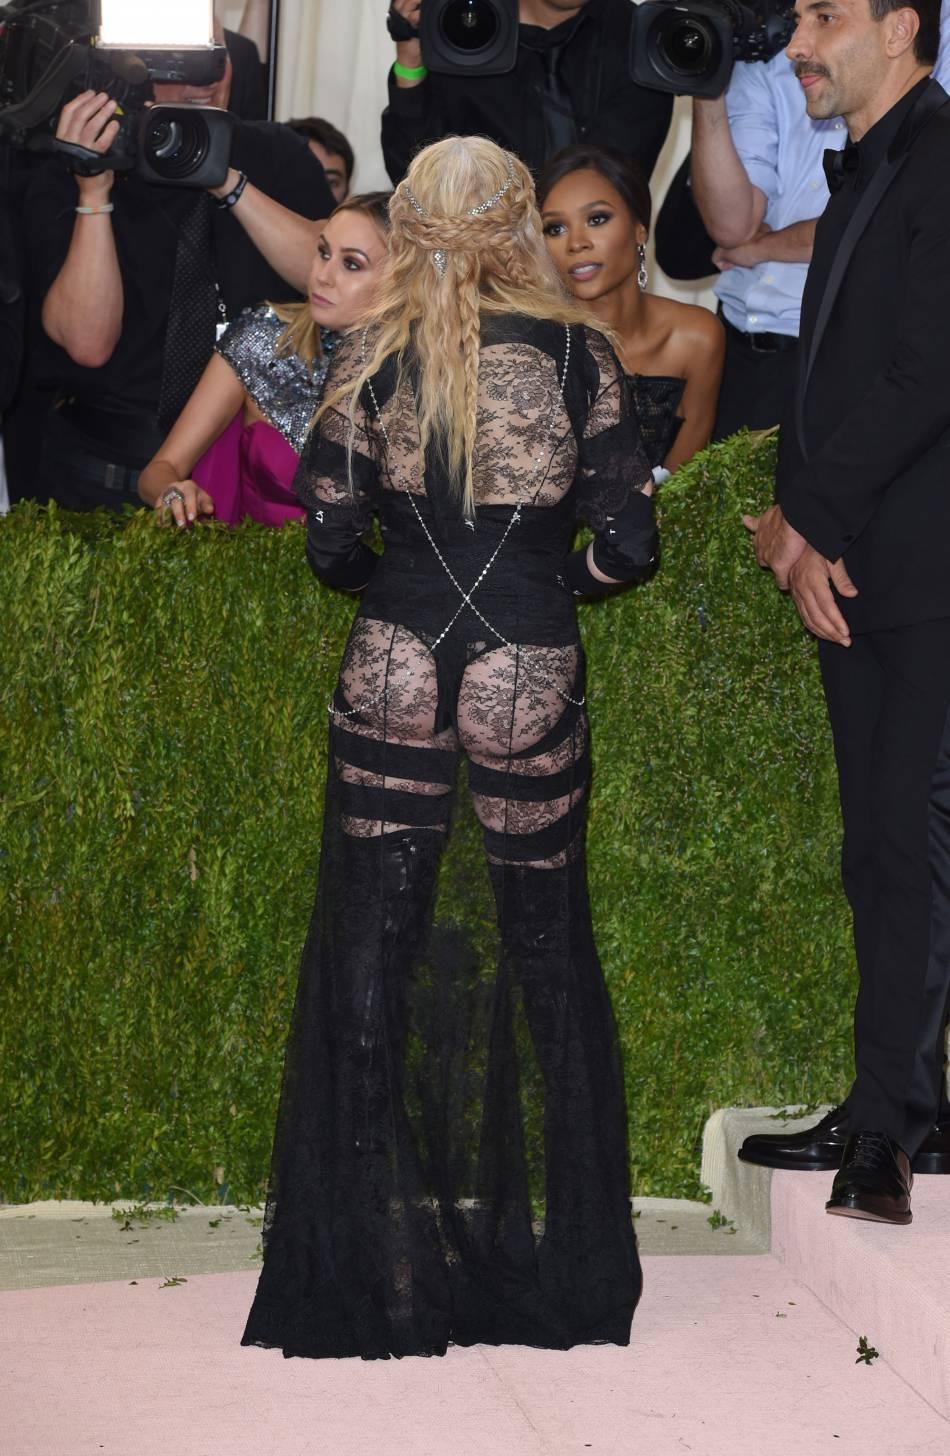 Madonna extravagante dans sa tenue osée, elle choque.